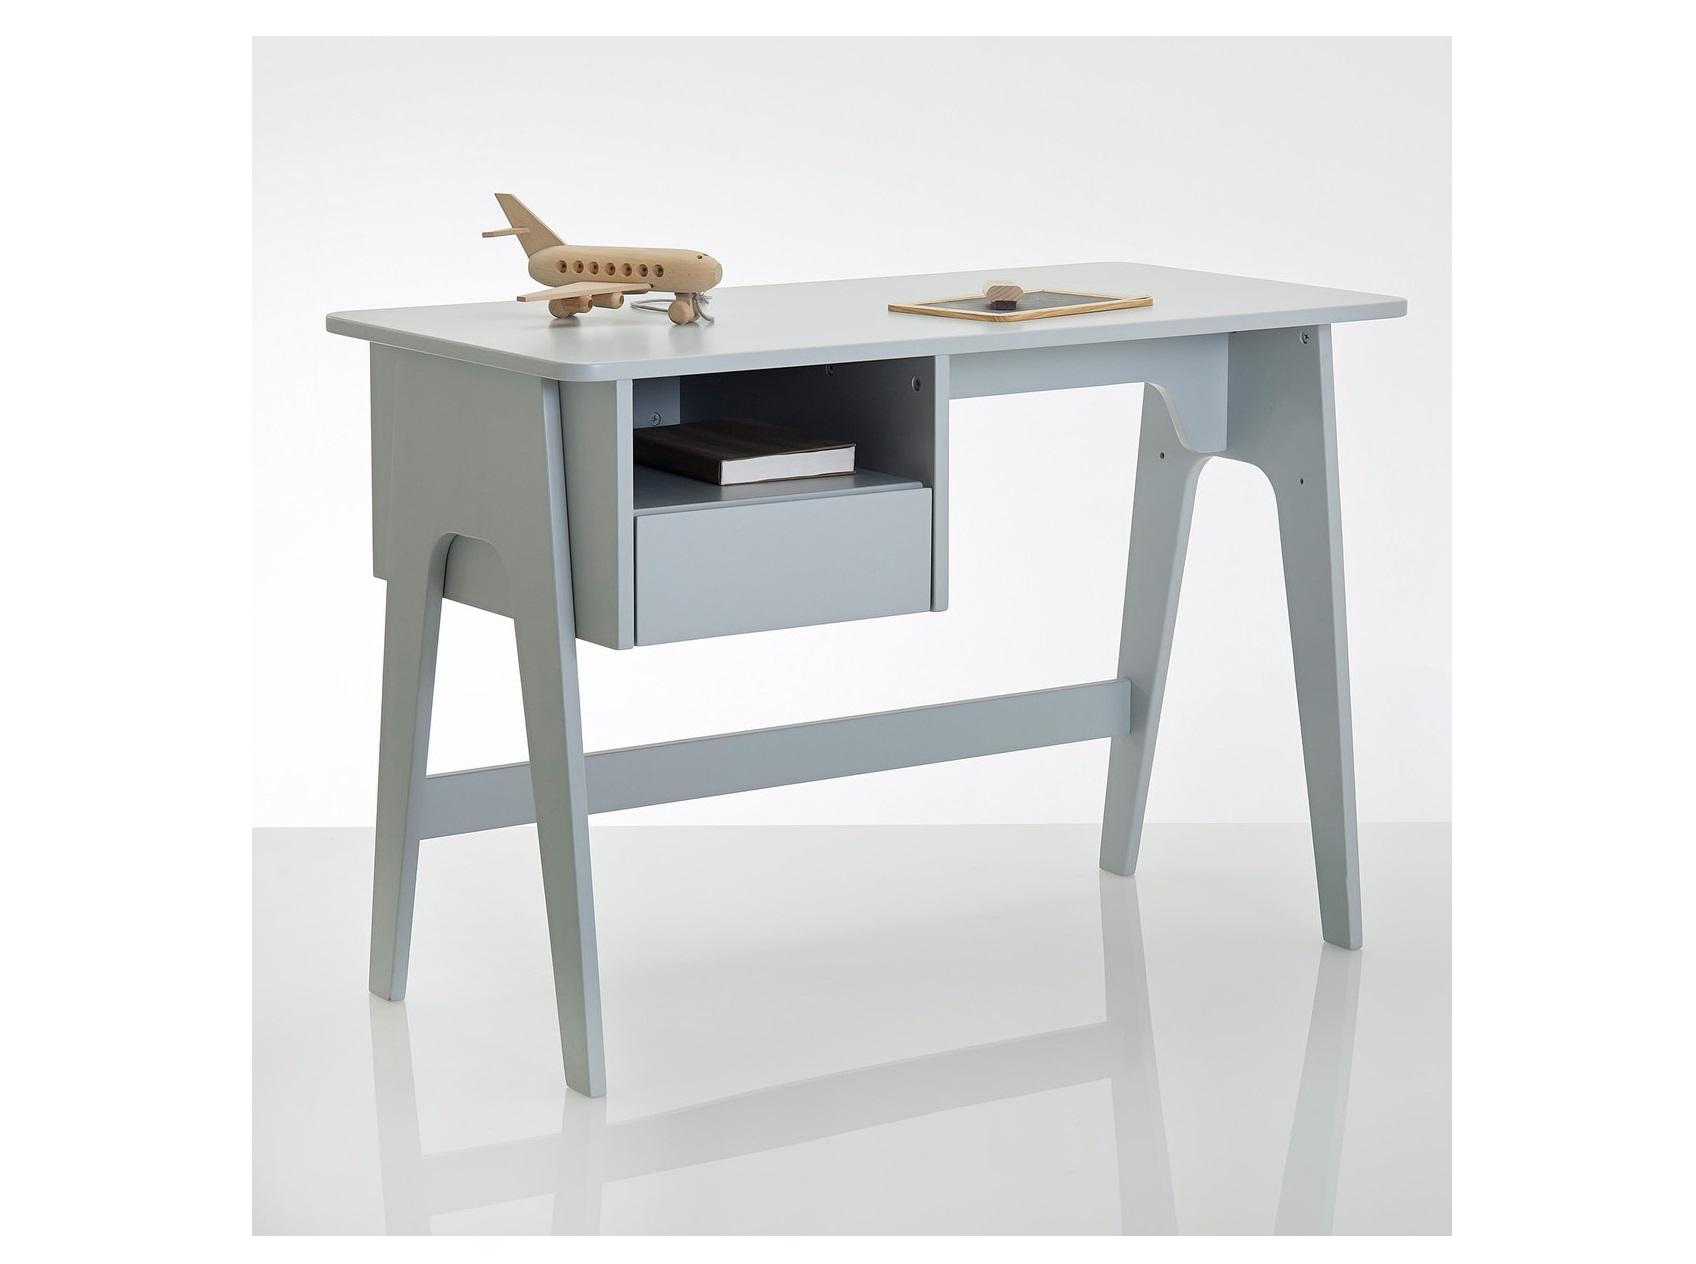 Письменный стол в стиле ретро adil (laredoute) серый 110x75x55 см.